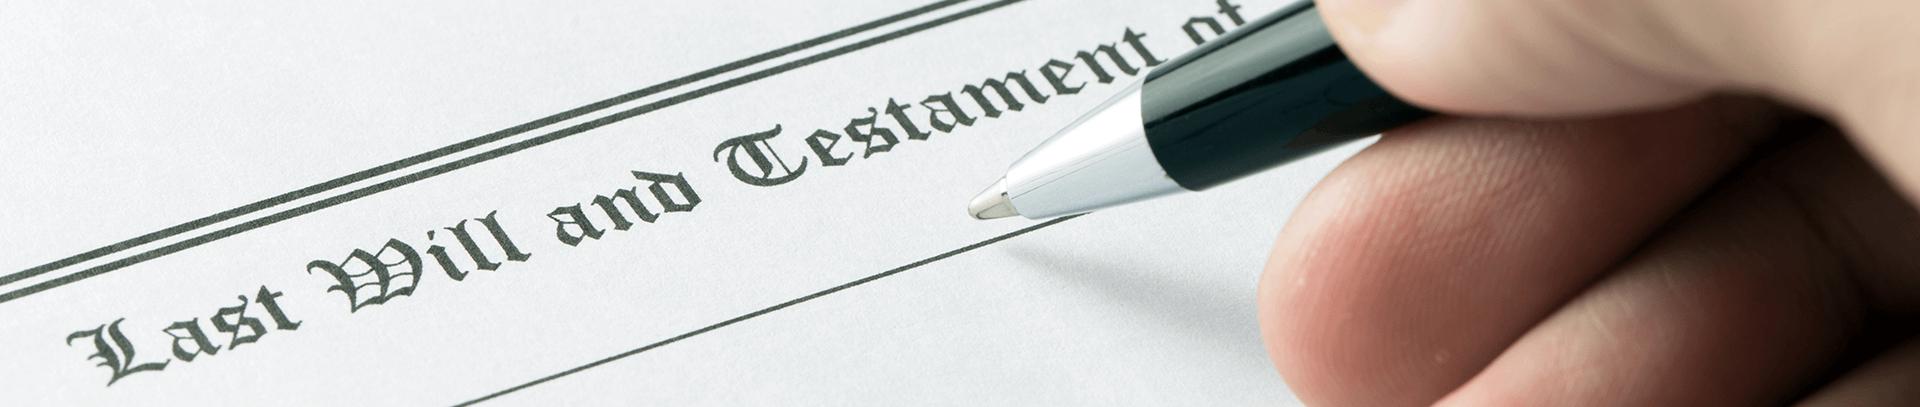 Wills & Probate Insurance